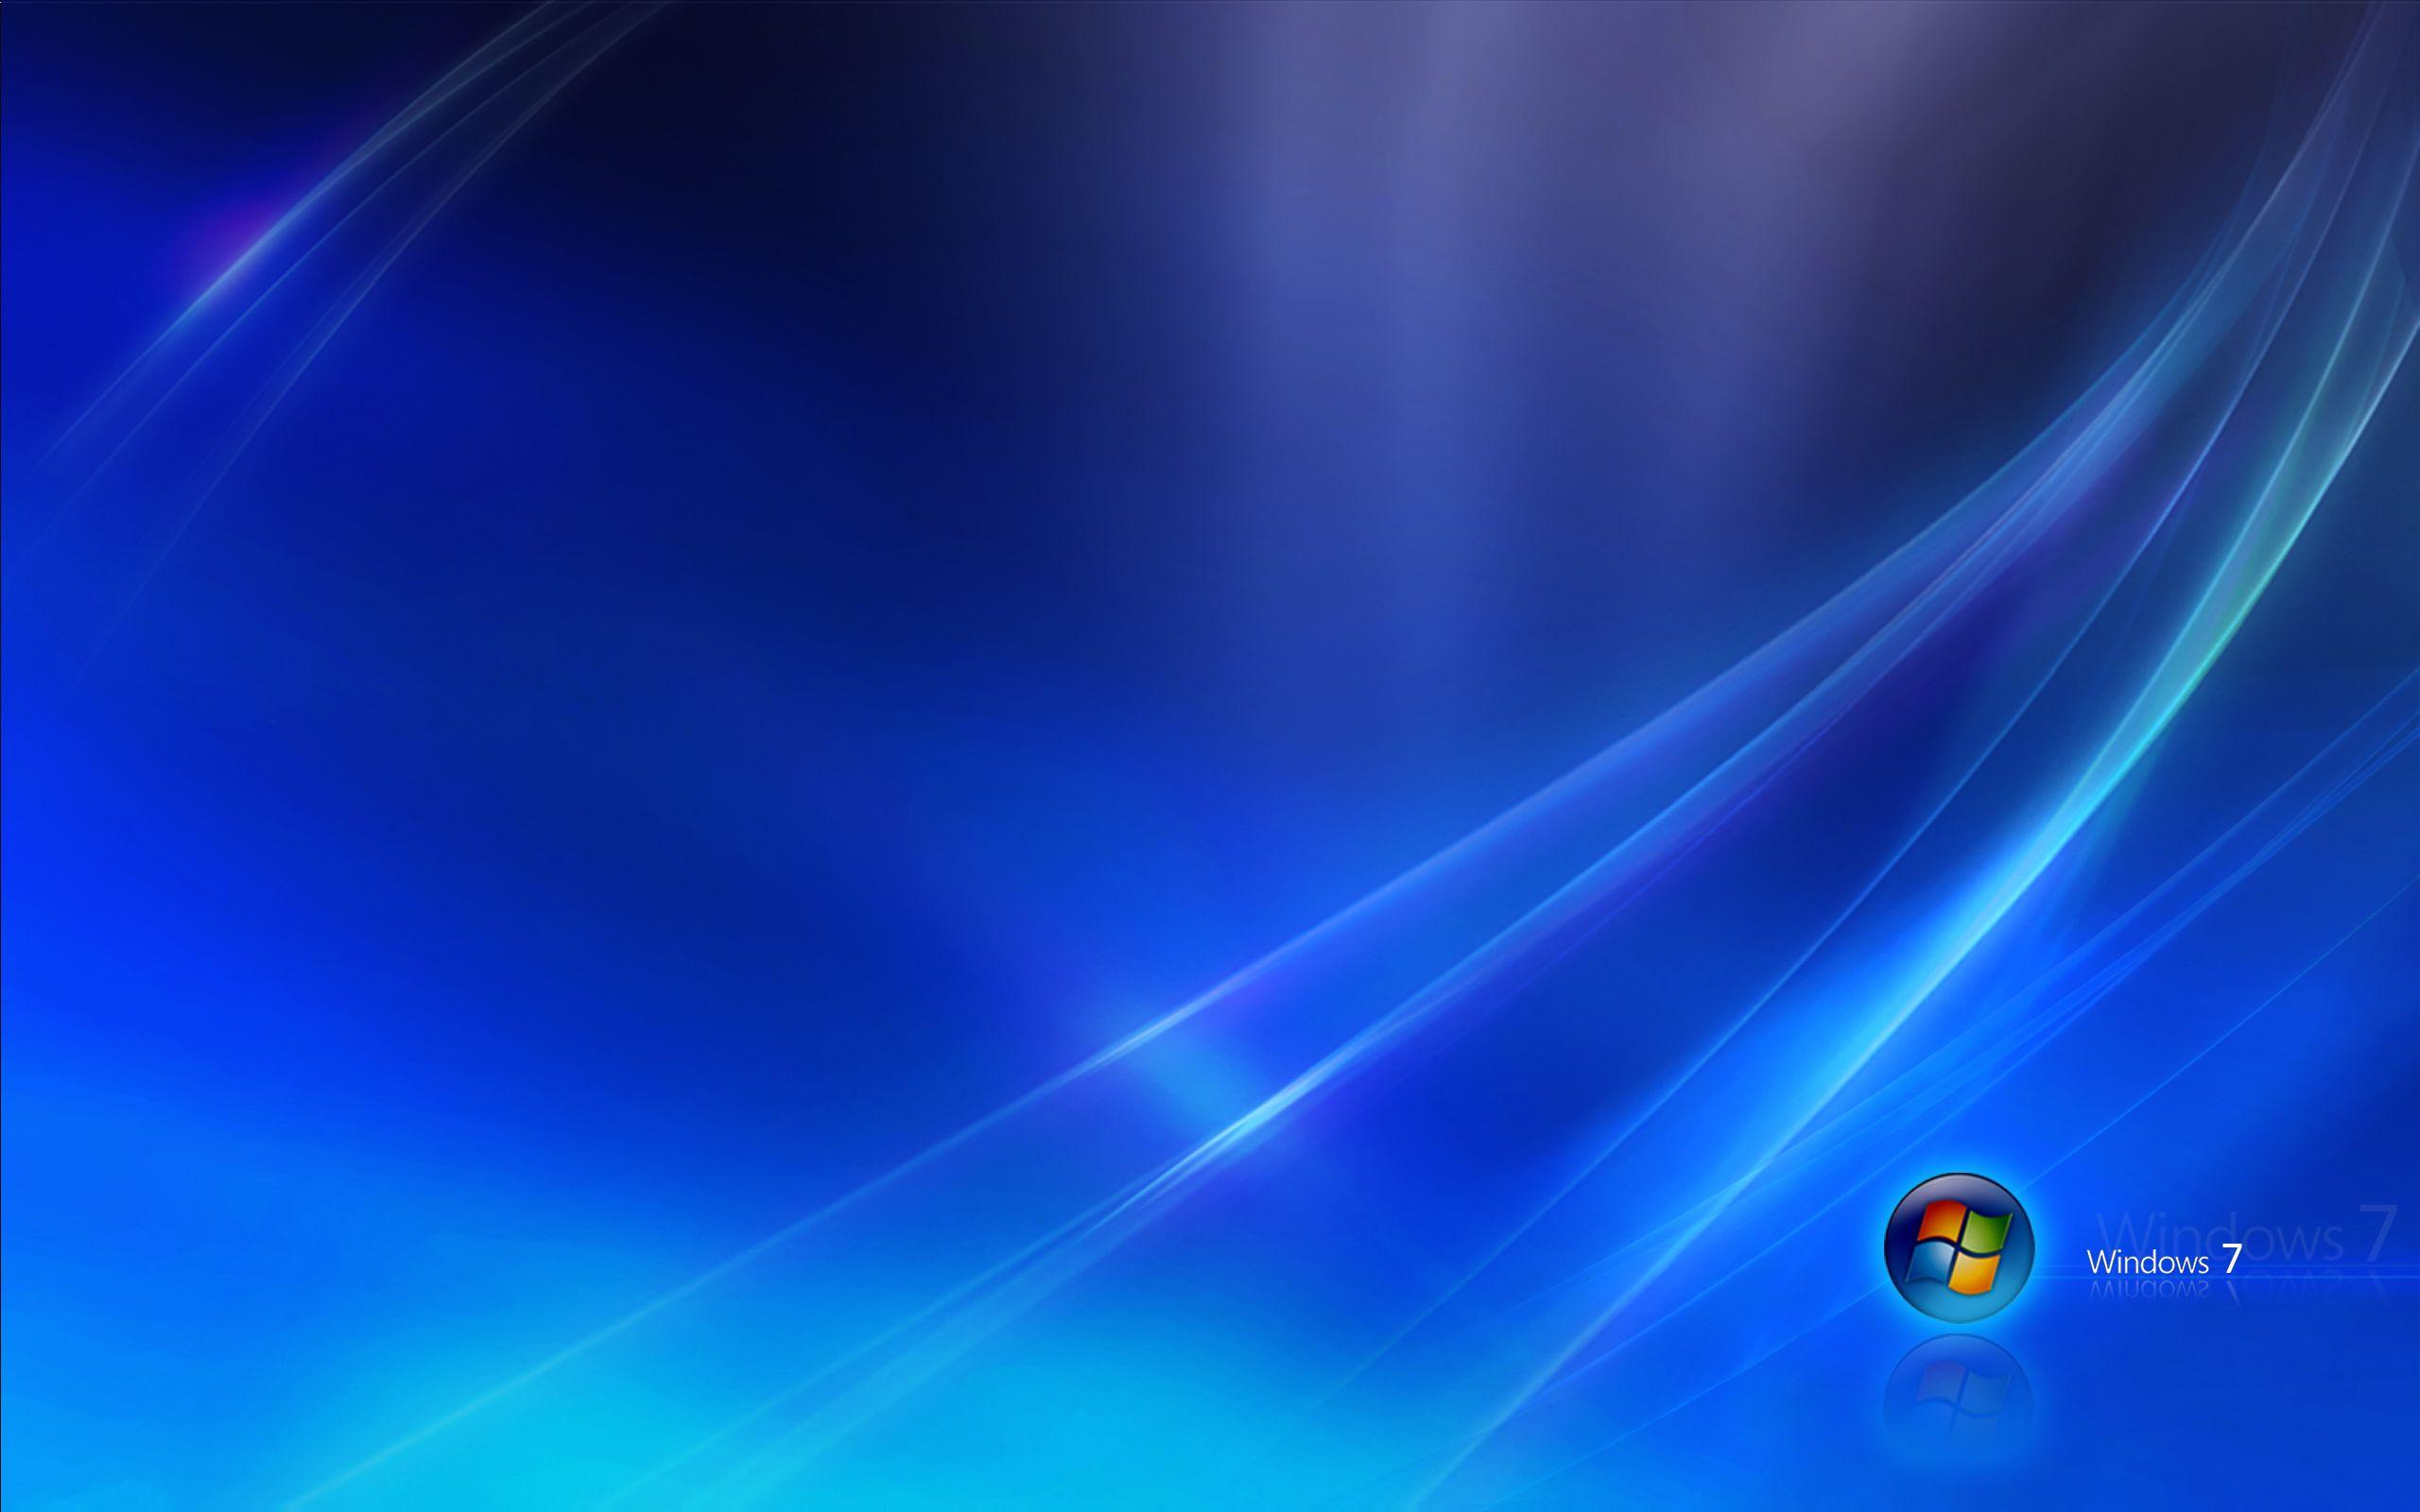 windows 7 blue dark wallpaper hd - http://imashon/brands-logos